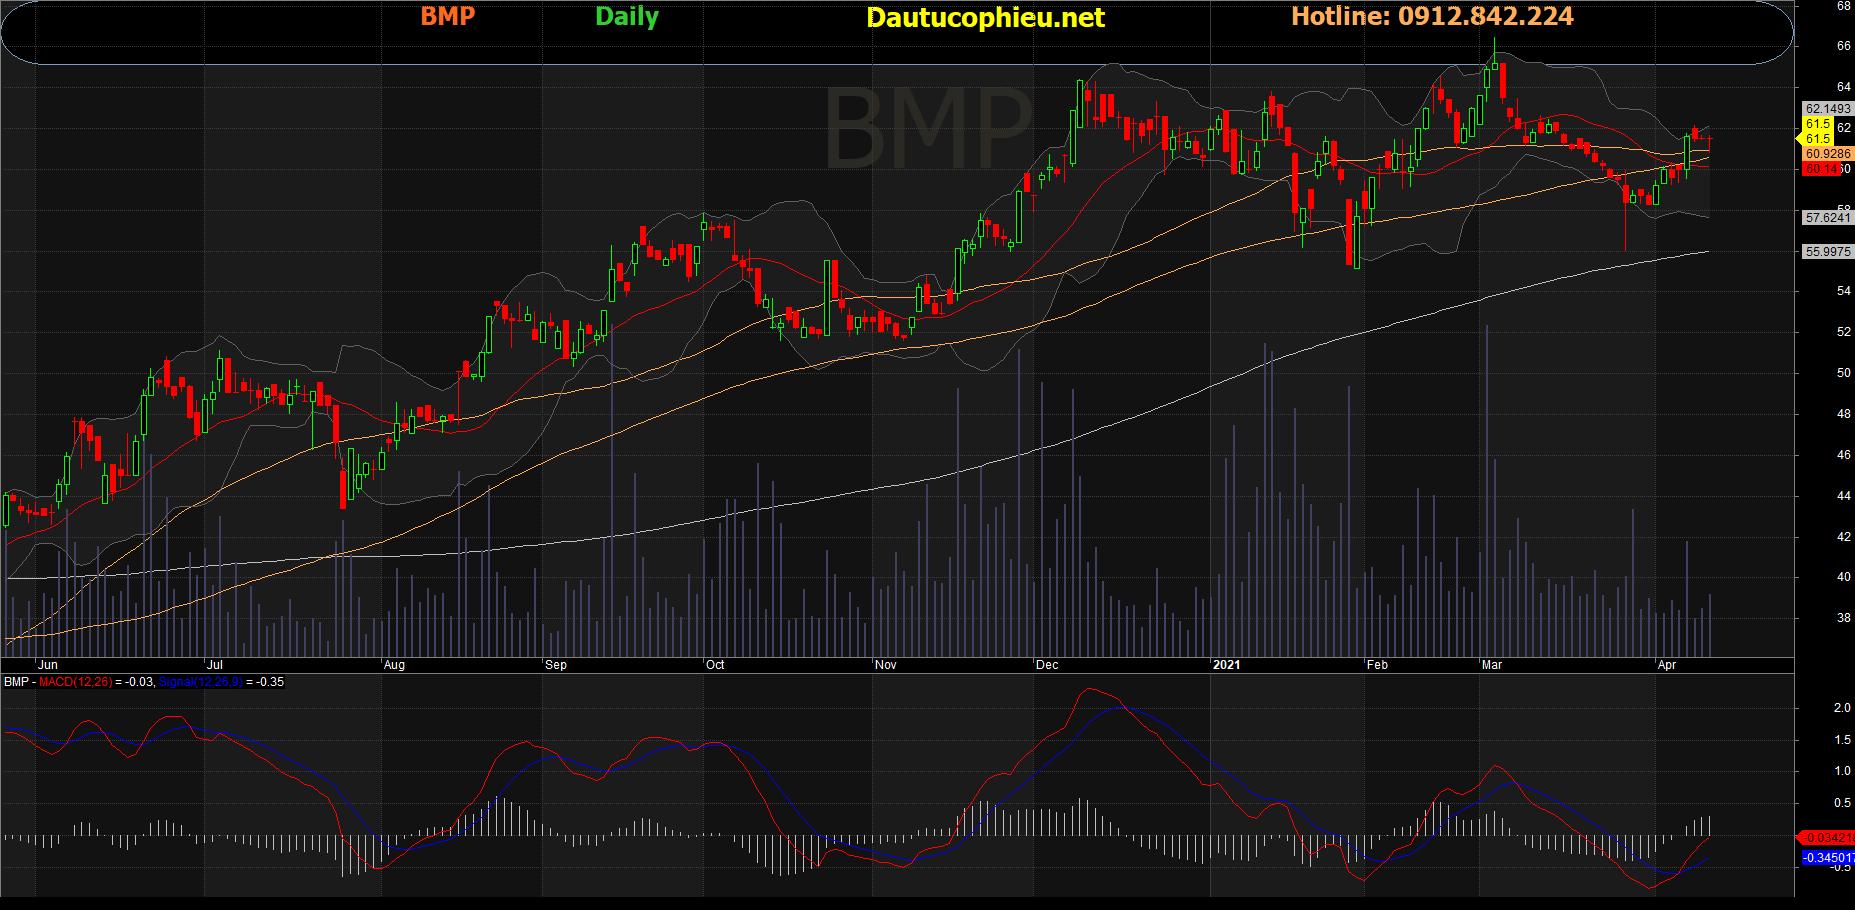 Cổ phiếu BMP